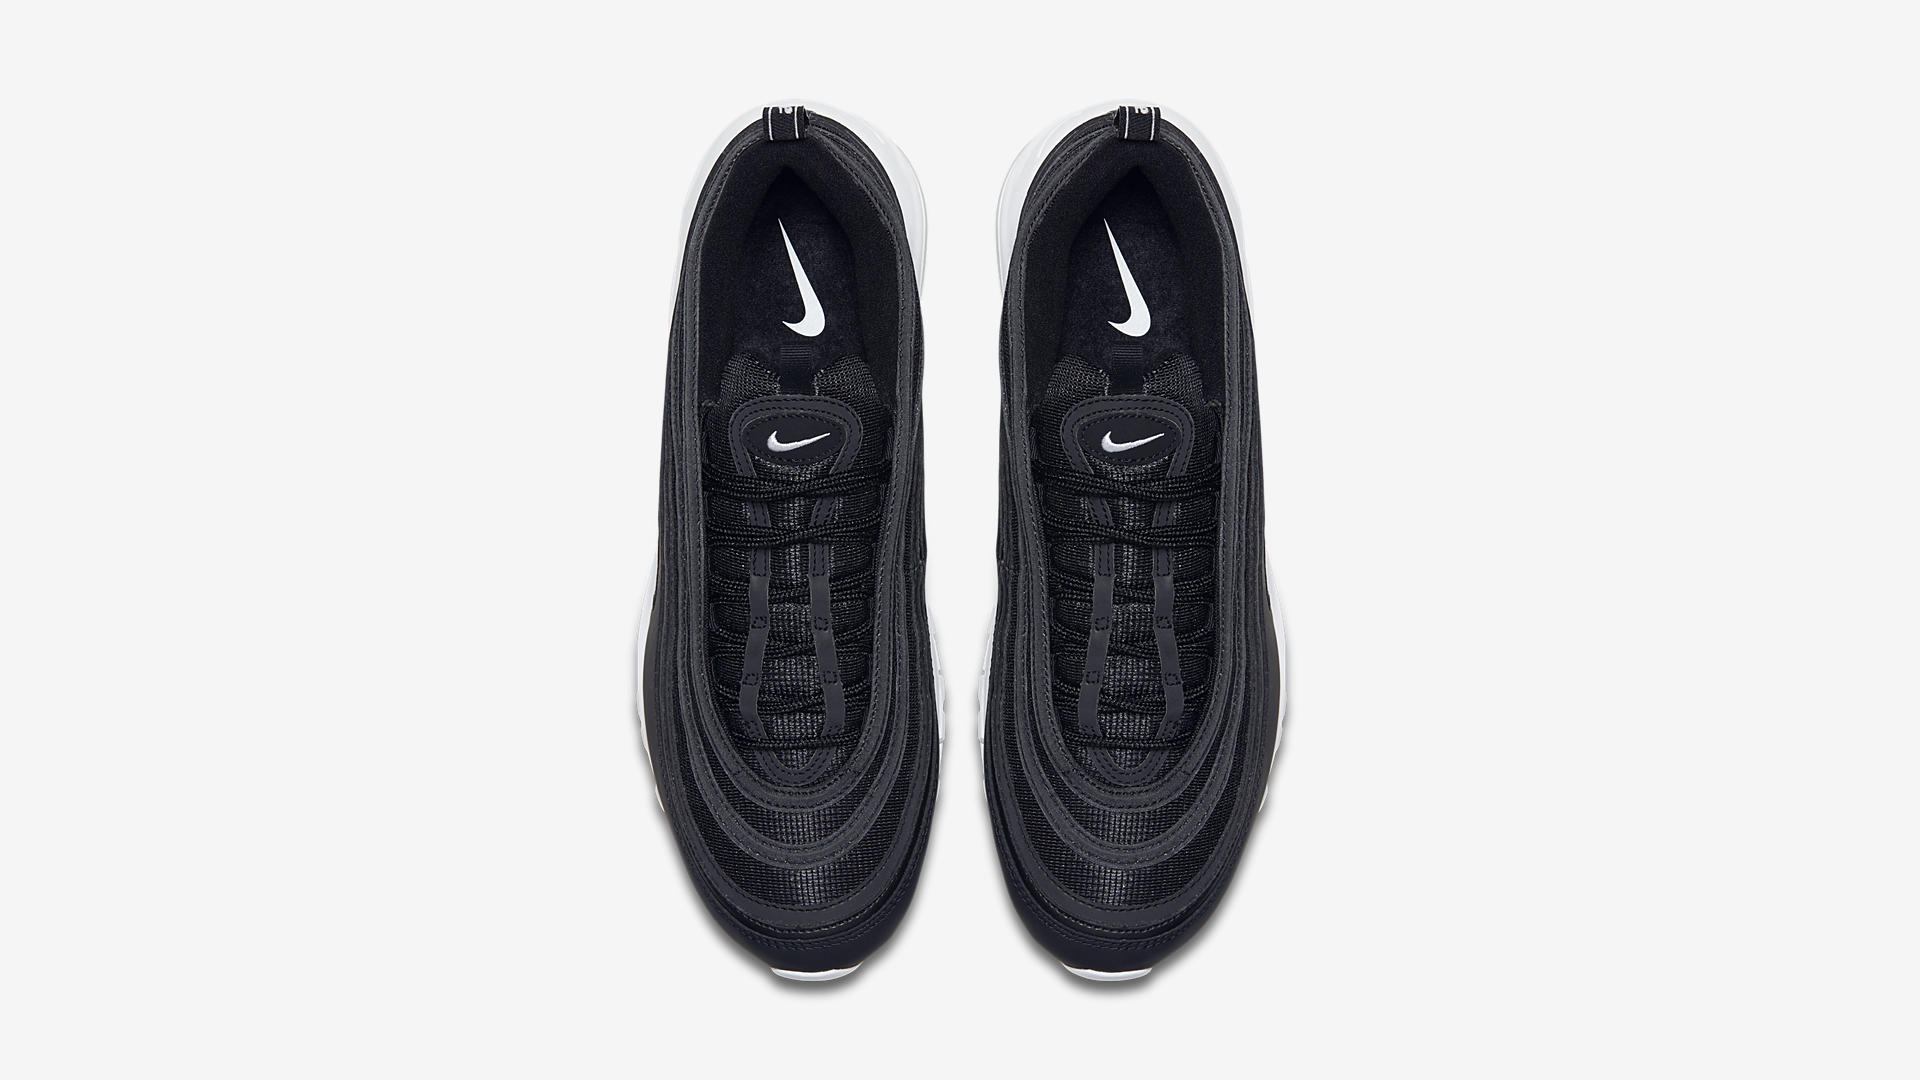 921826 001 Nike Air Max 97 Black White 3